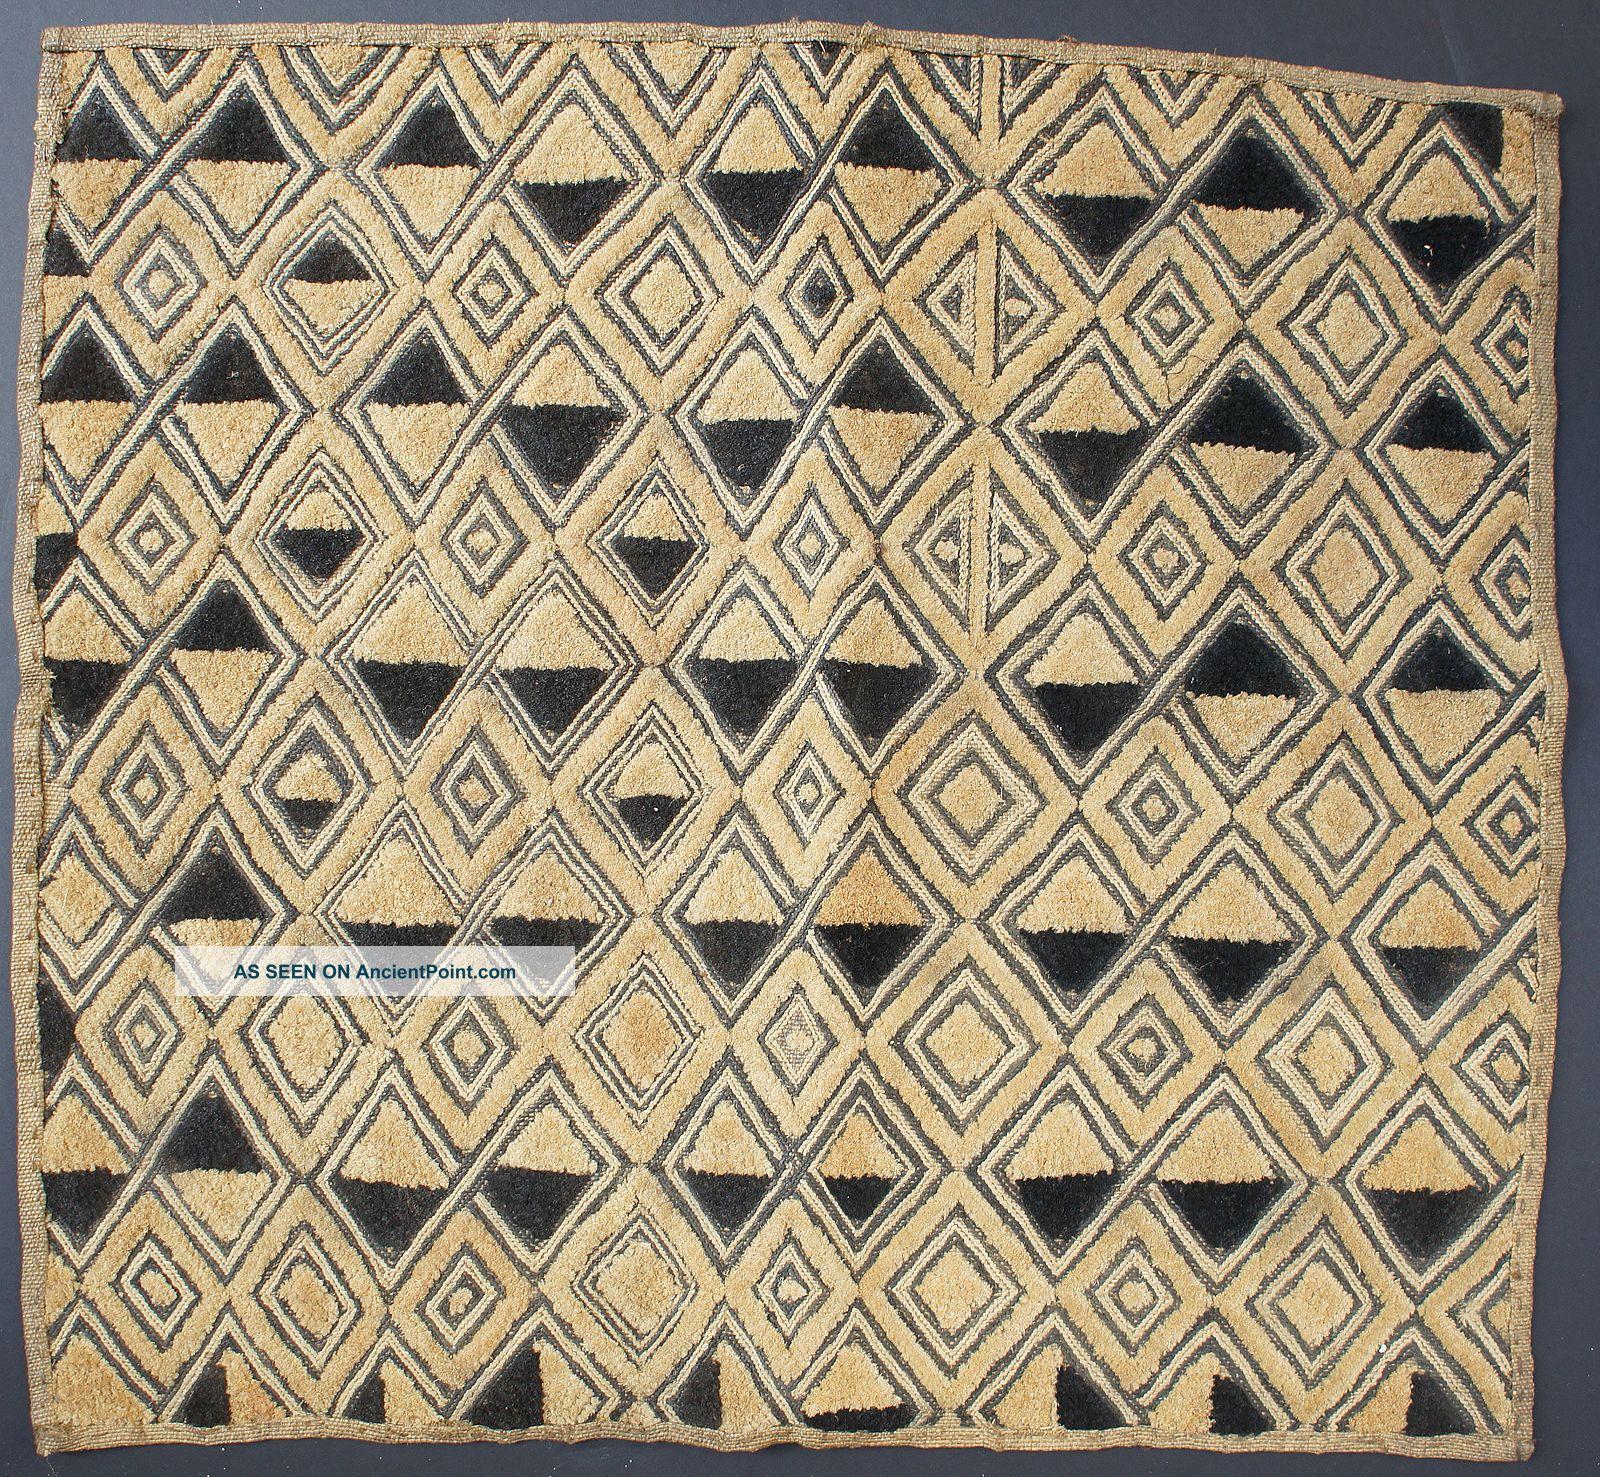 Cloth Textile African Kuba Raffia Currency Kasaai Butala Dr Congo Zaire Ethnix Other photo